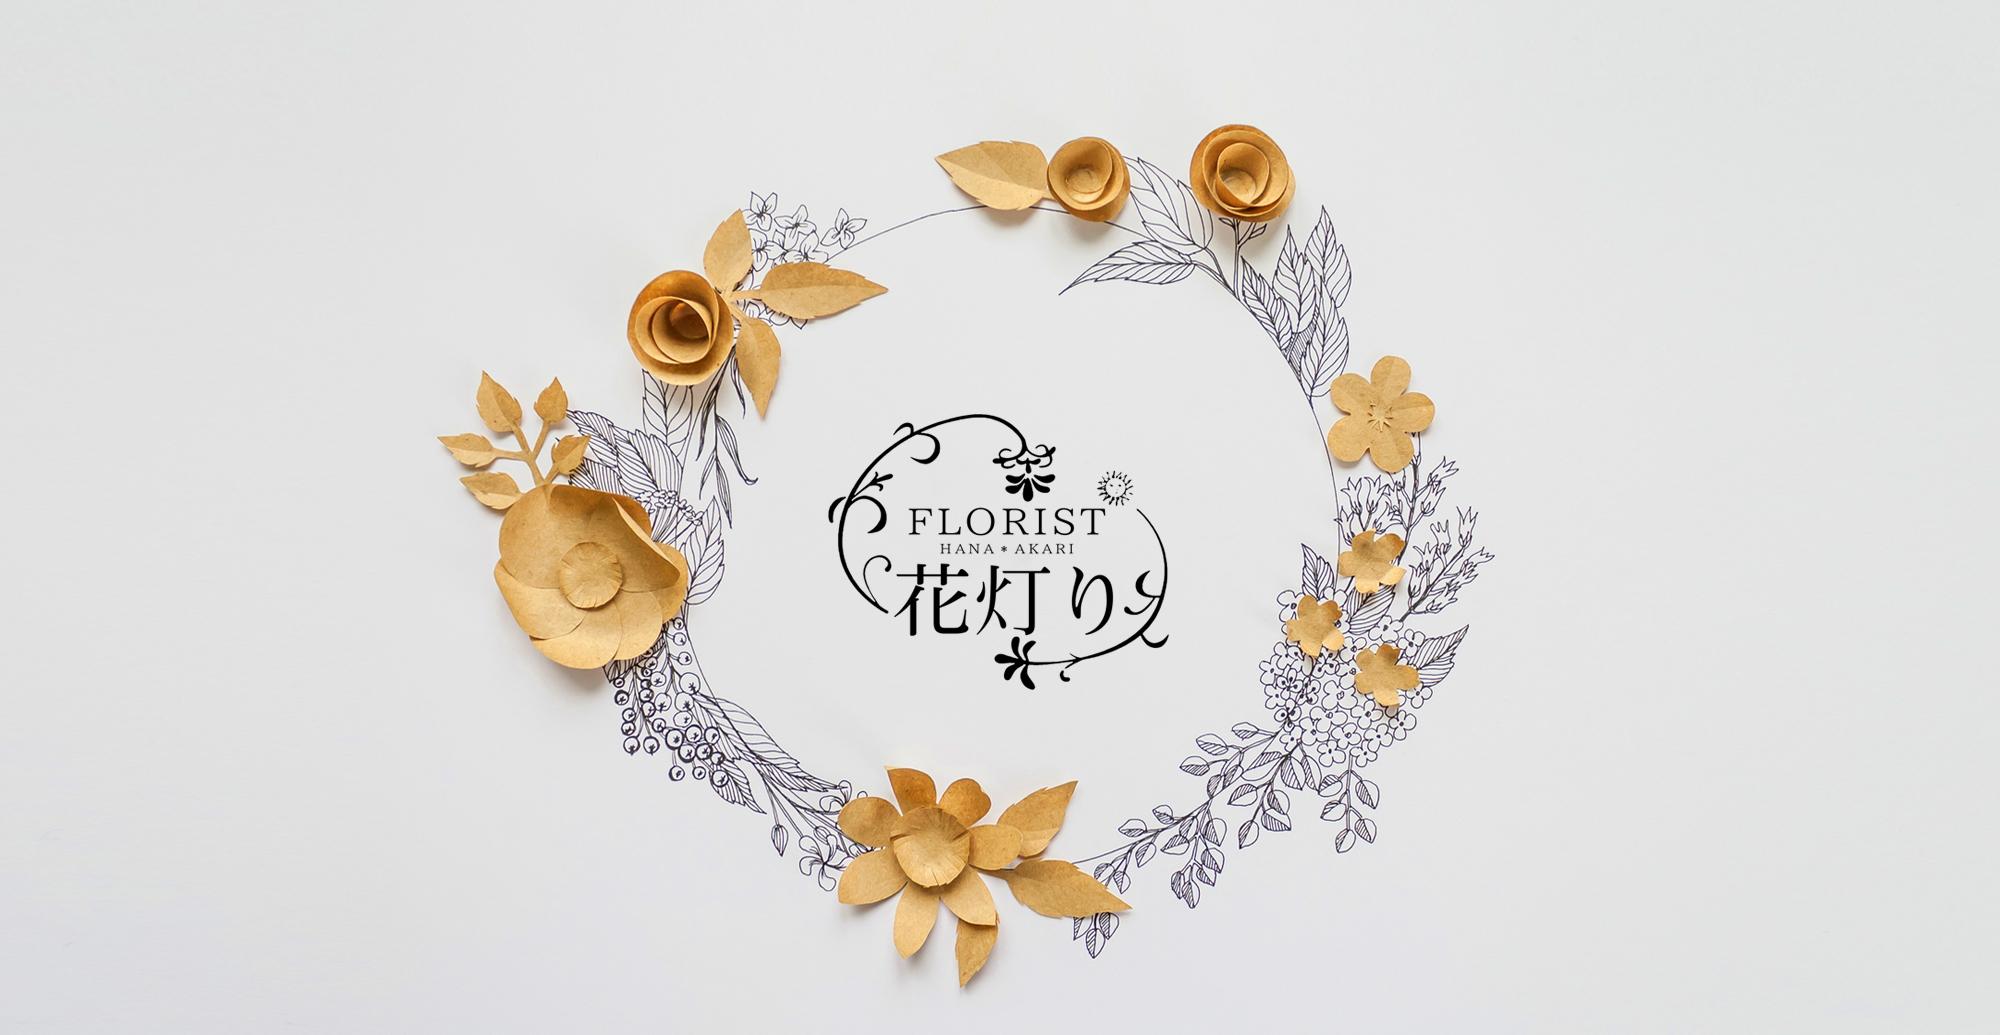 Florist 花灯り